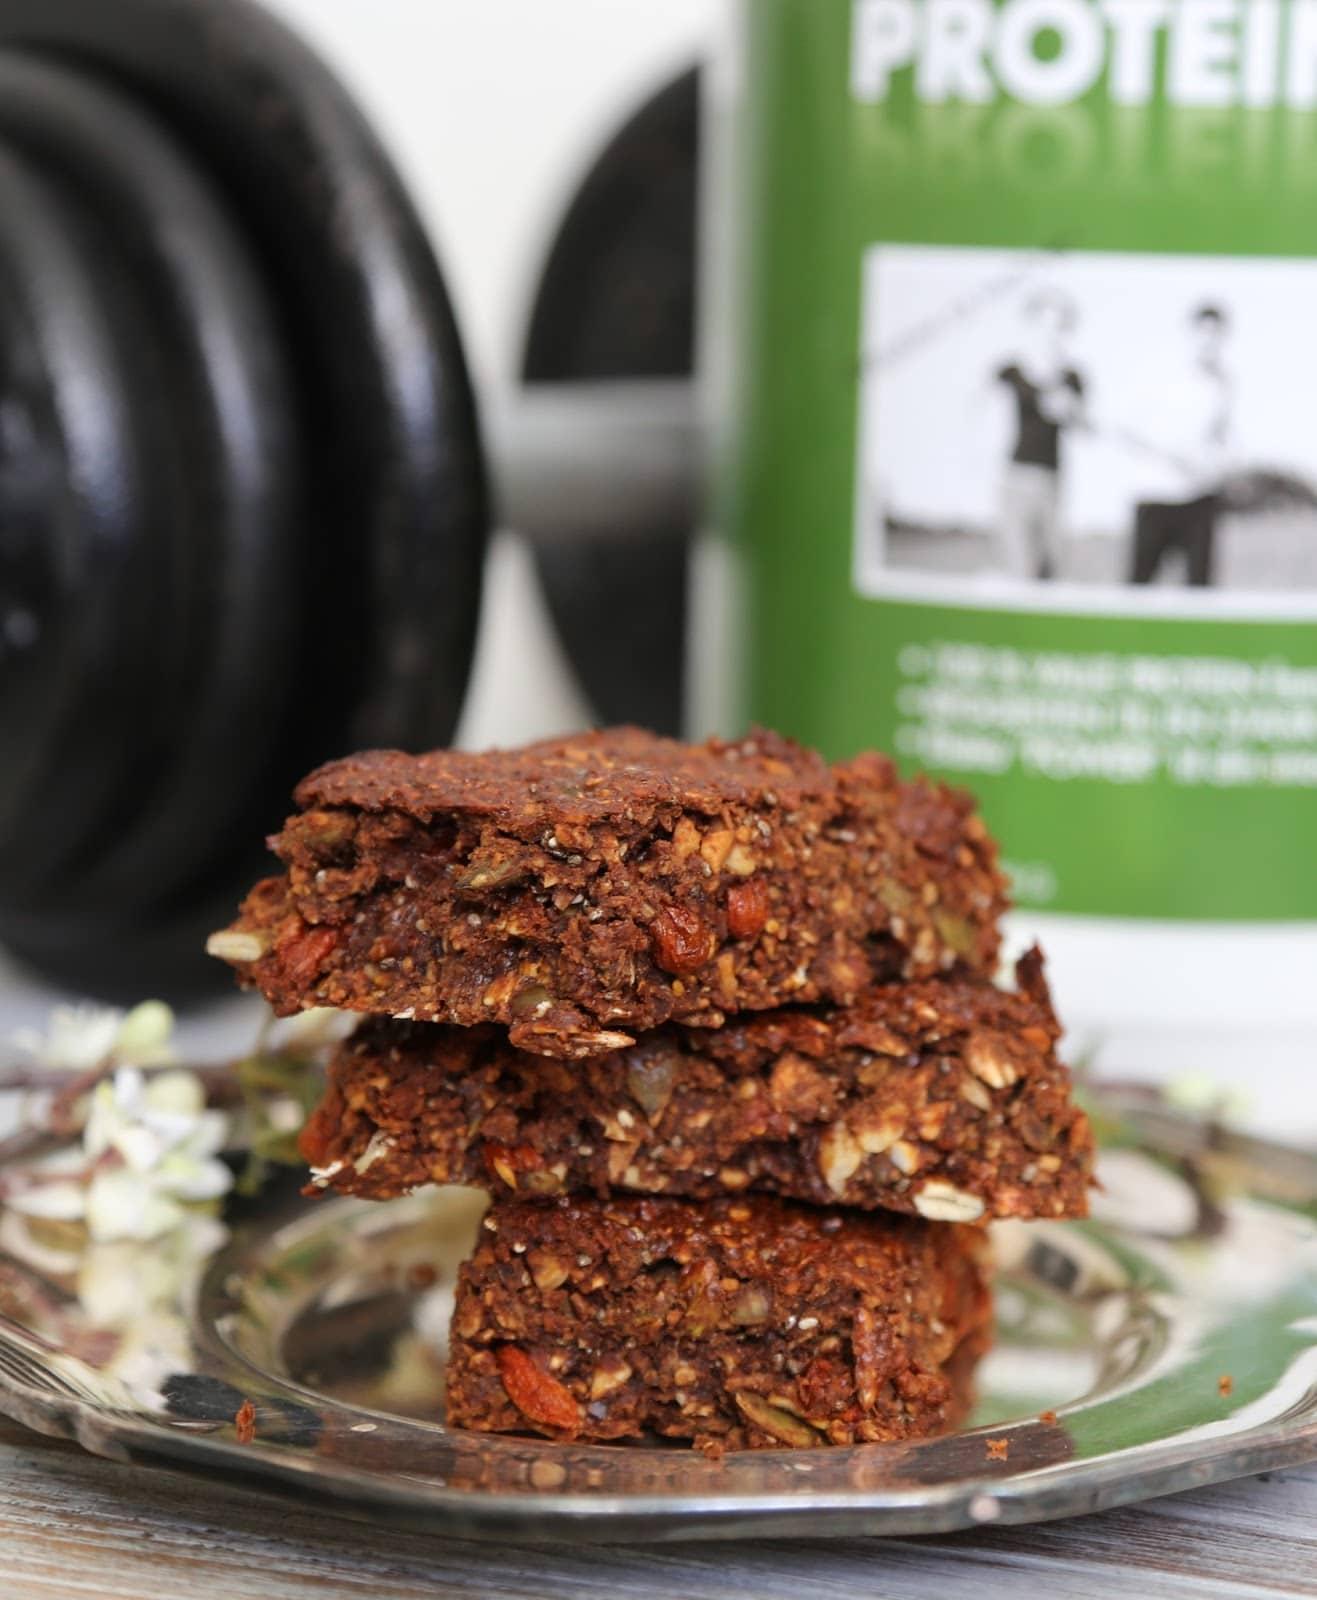 hjemmelavet proteinbar, sund mellemmåltid